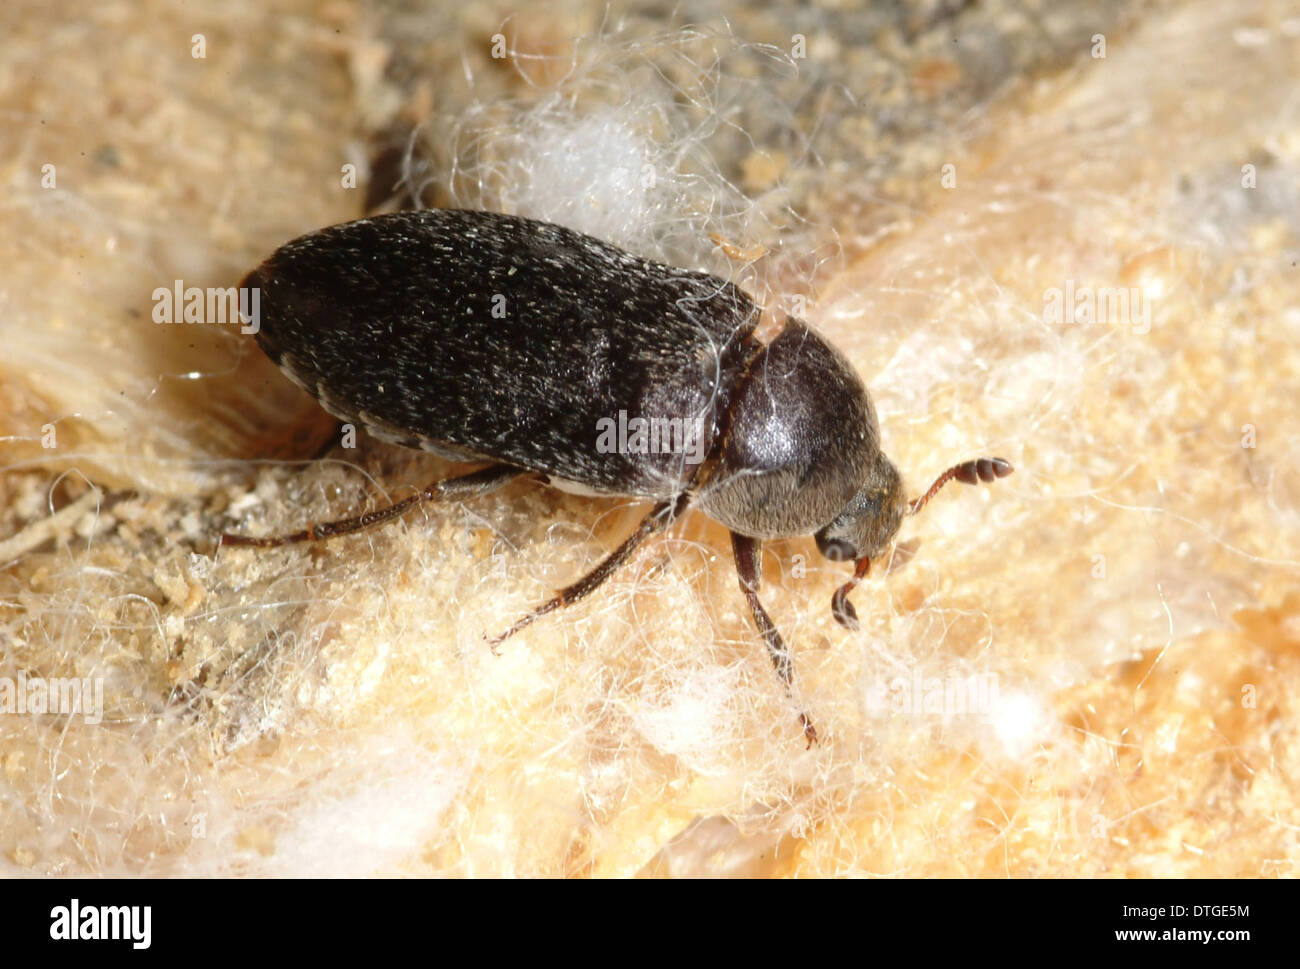 Dermestes maculatus, flesh-eating beetle Stock Photo